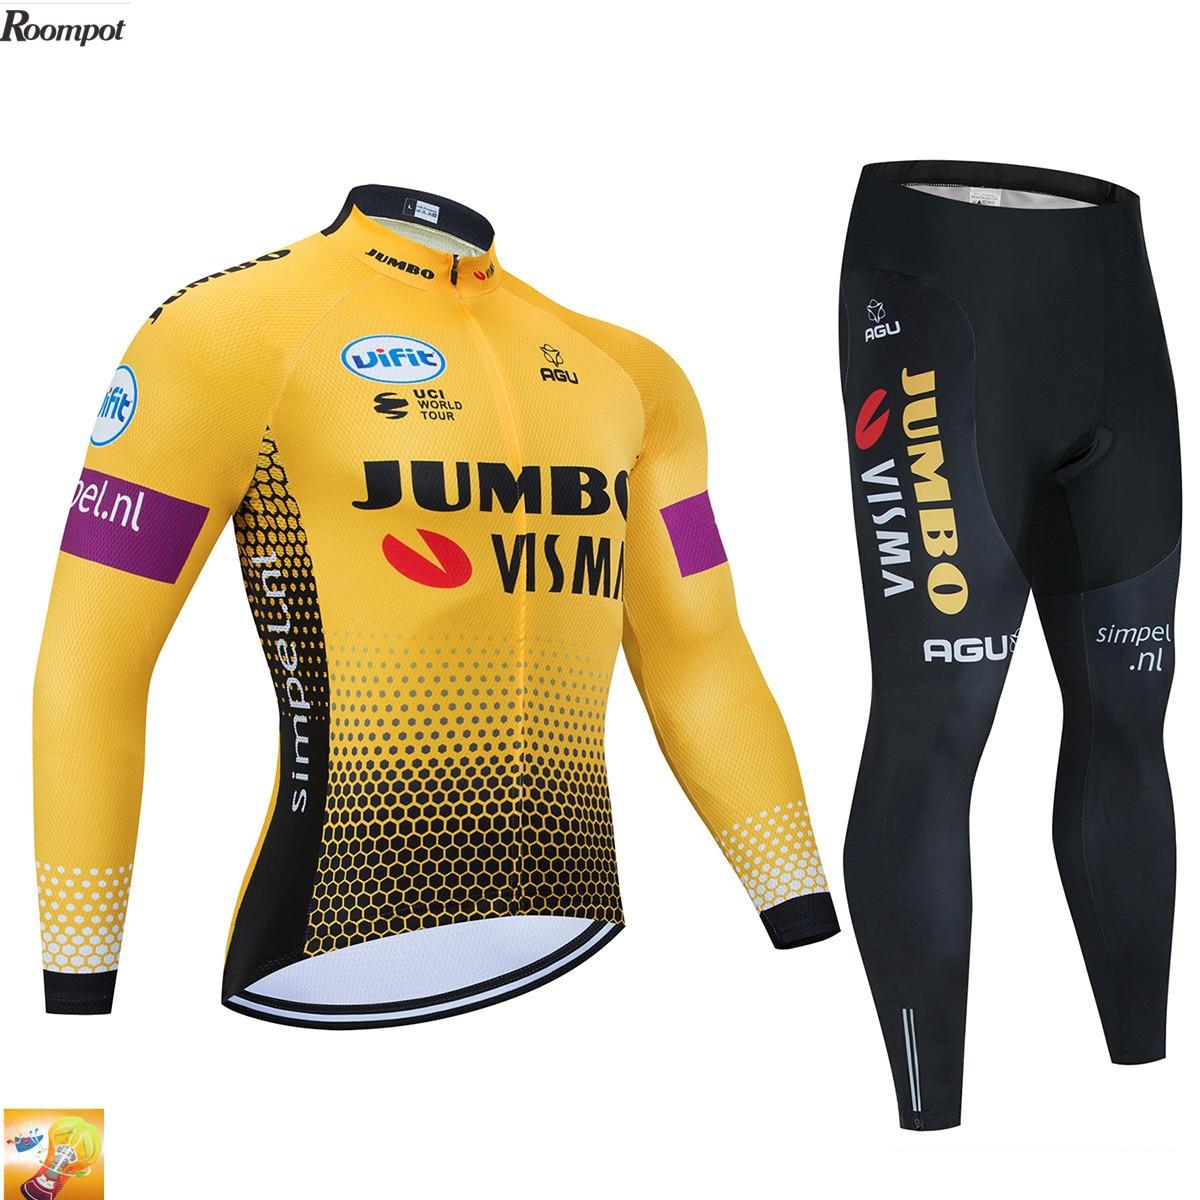 Ropa de ciclismo Jumbo Visma para hombre, ropa de ciclismo de manga larga de otoño amarillo, ropa de ciclismo para hombre, Conjunto de Jersey de ciclismo para equipo 16D Gel